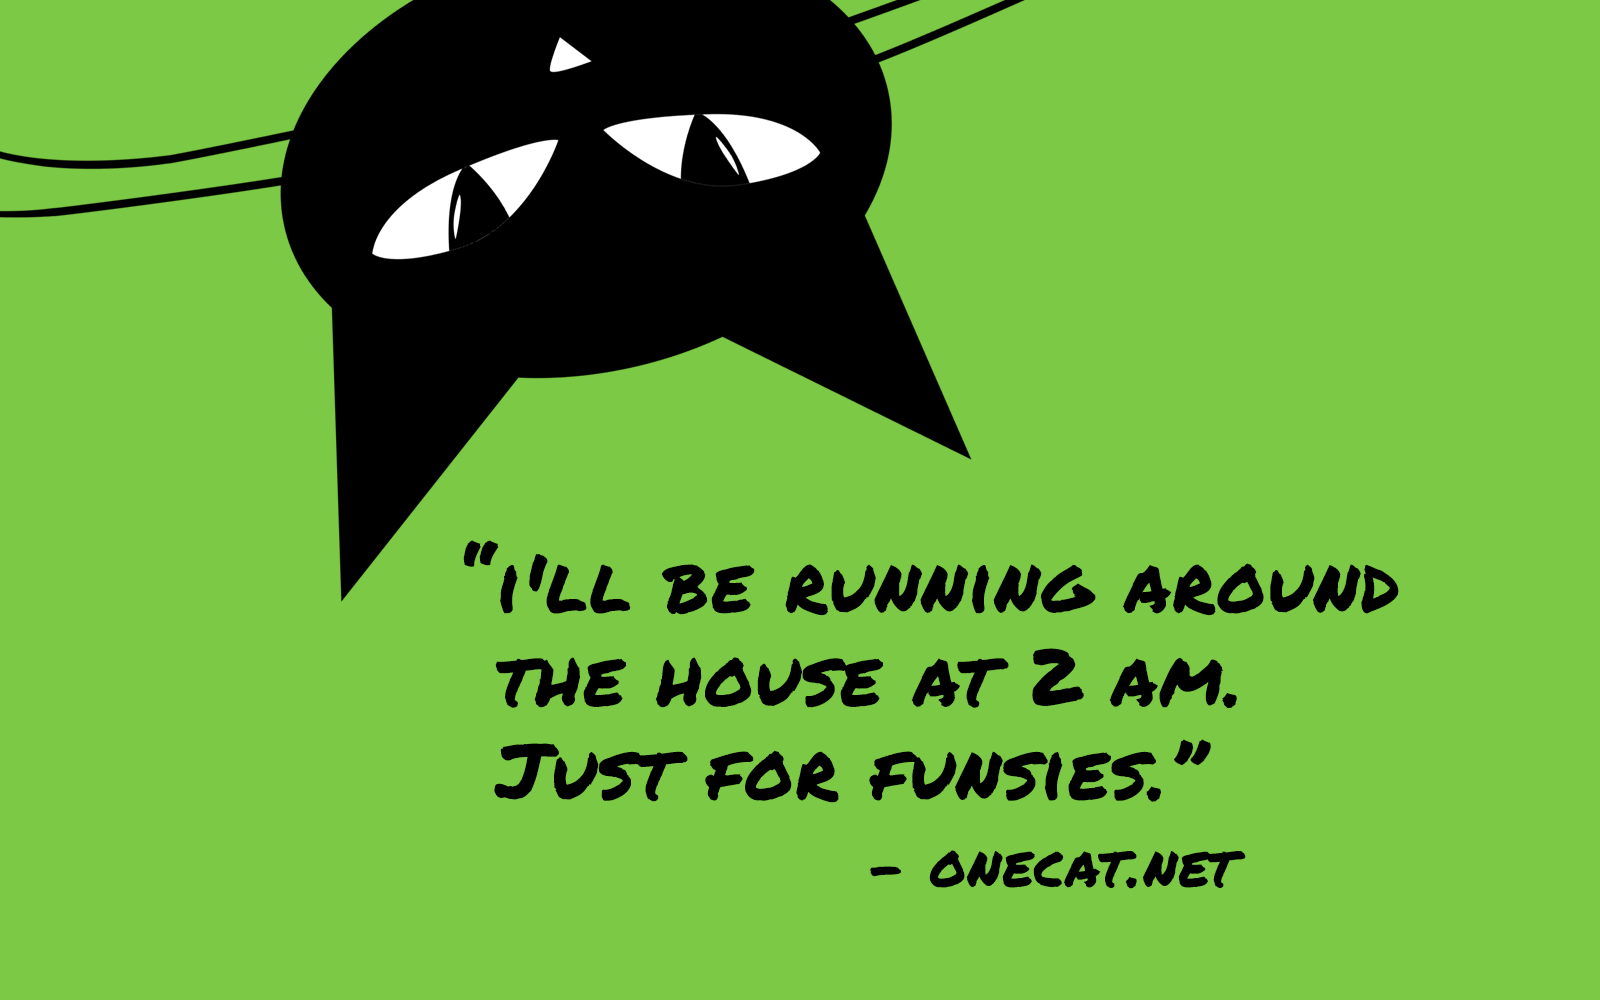 Cats Love Running Around the House at Night